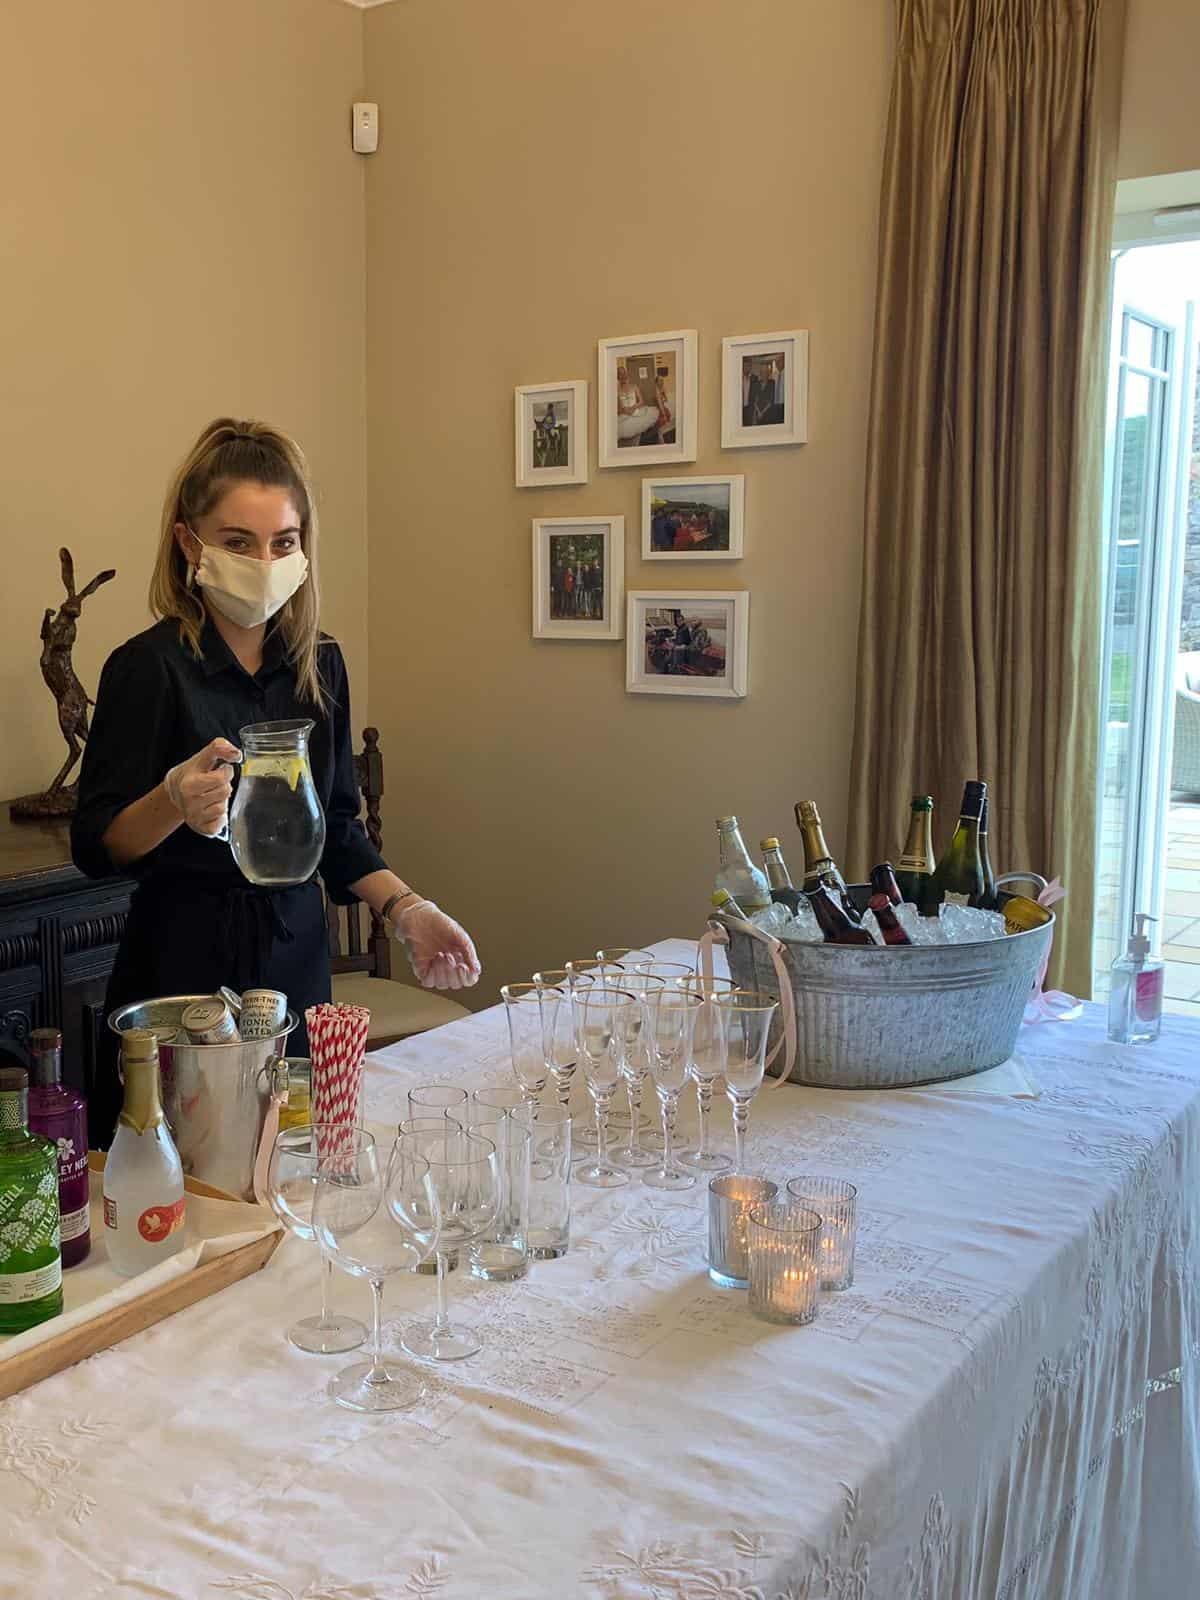 Family Wedding in the Time of Coronavirus